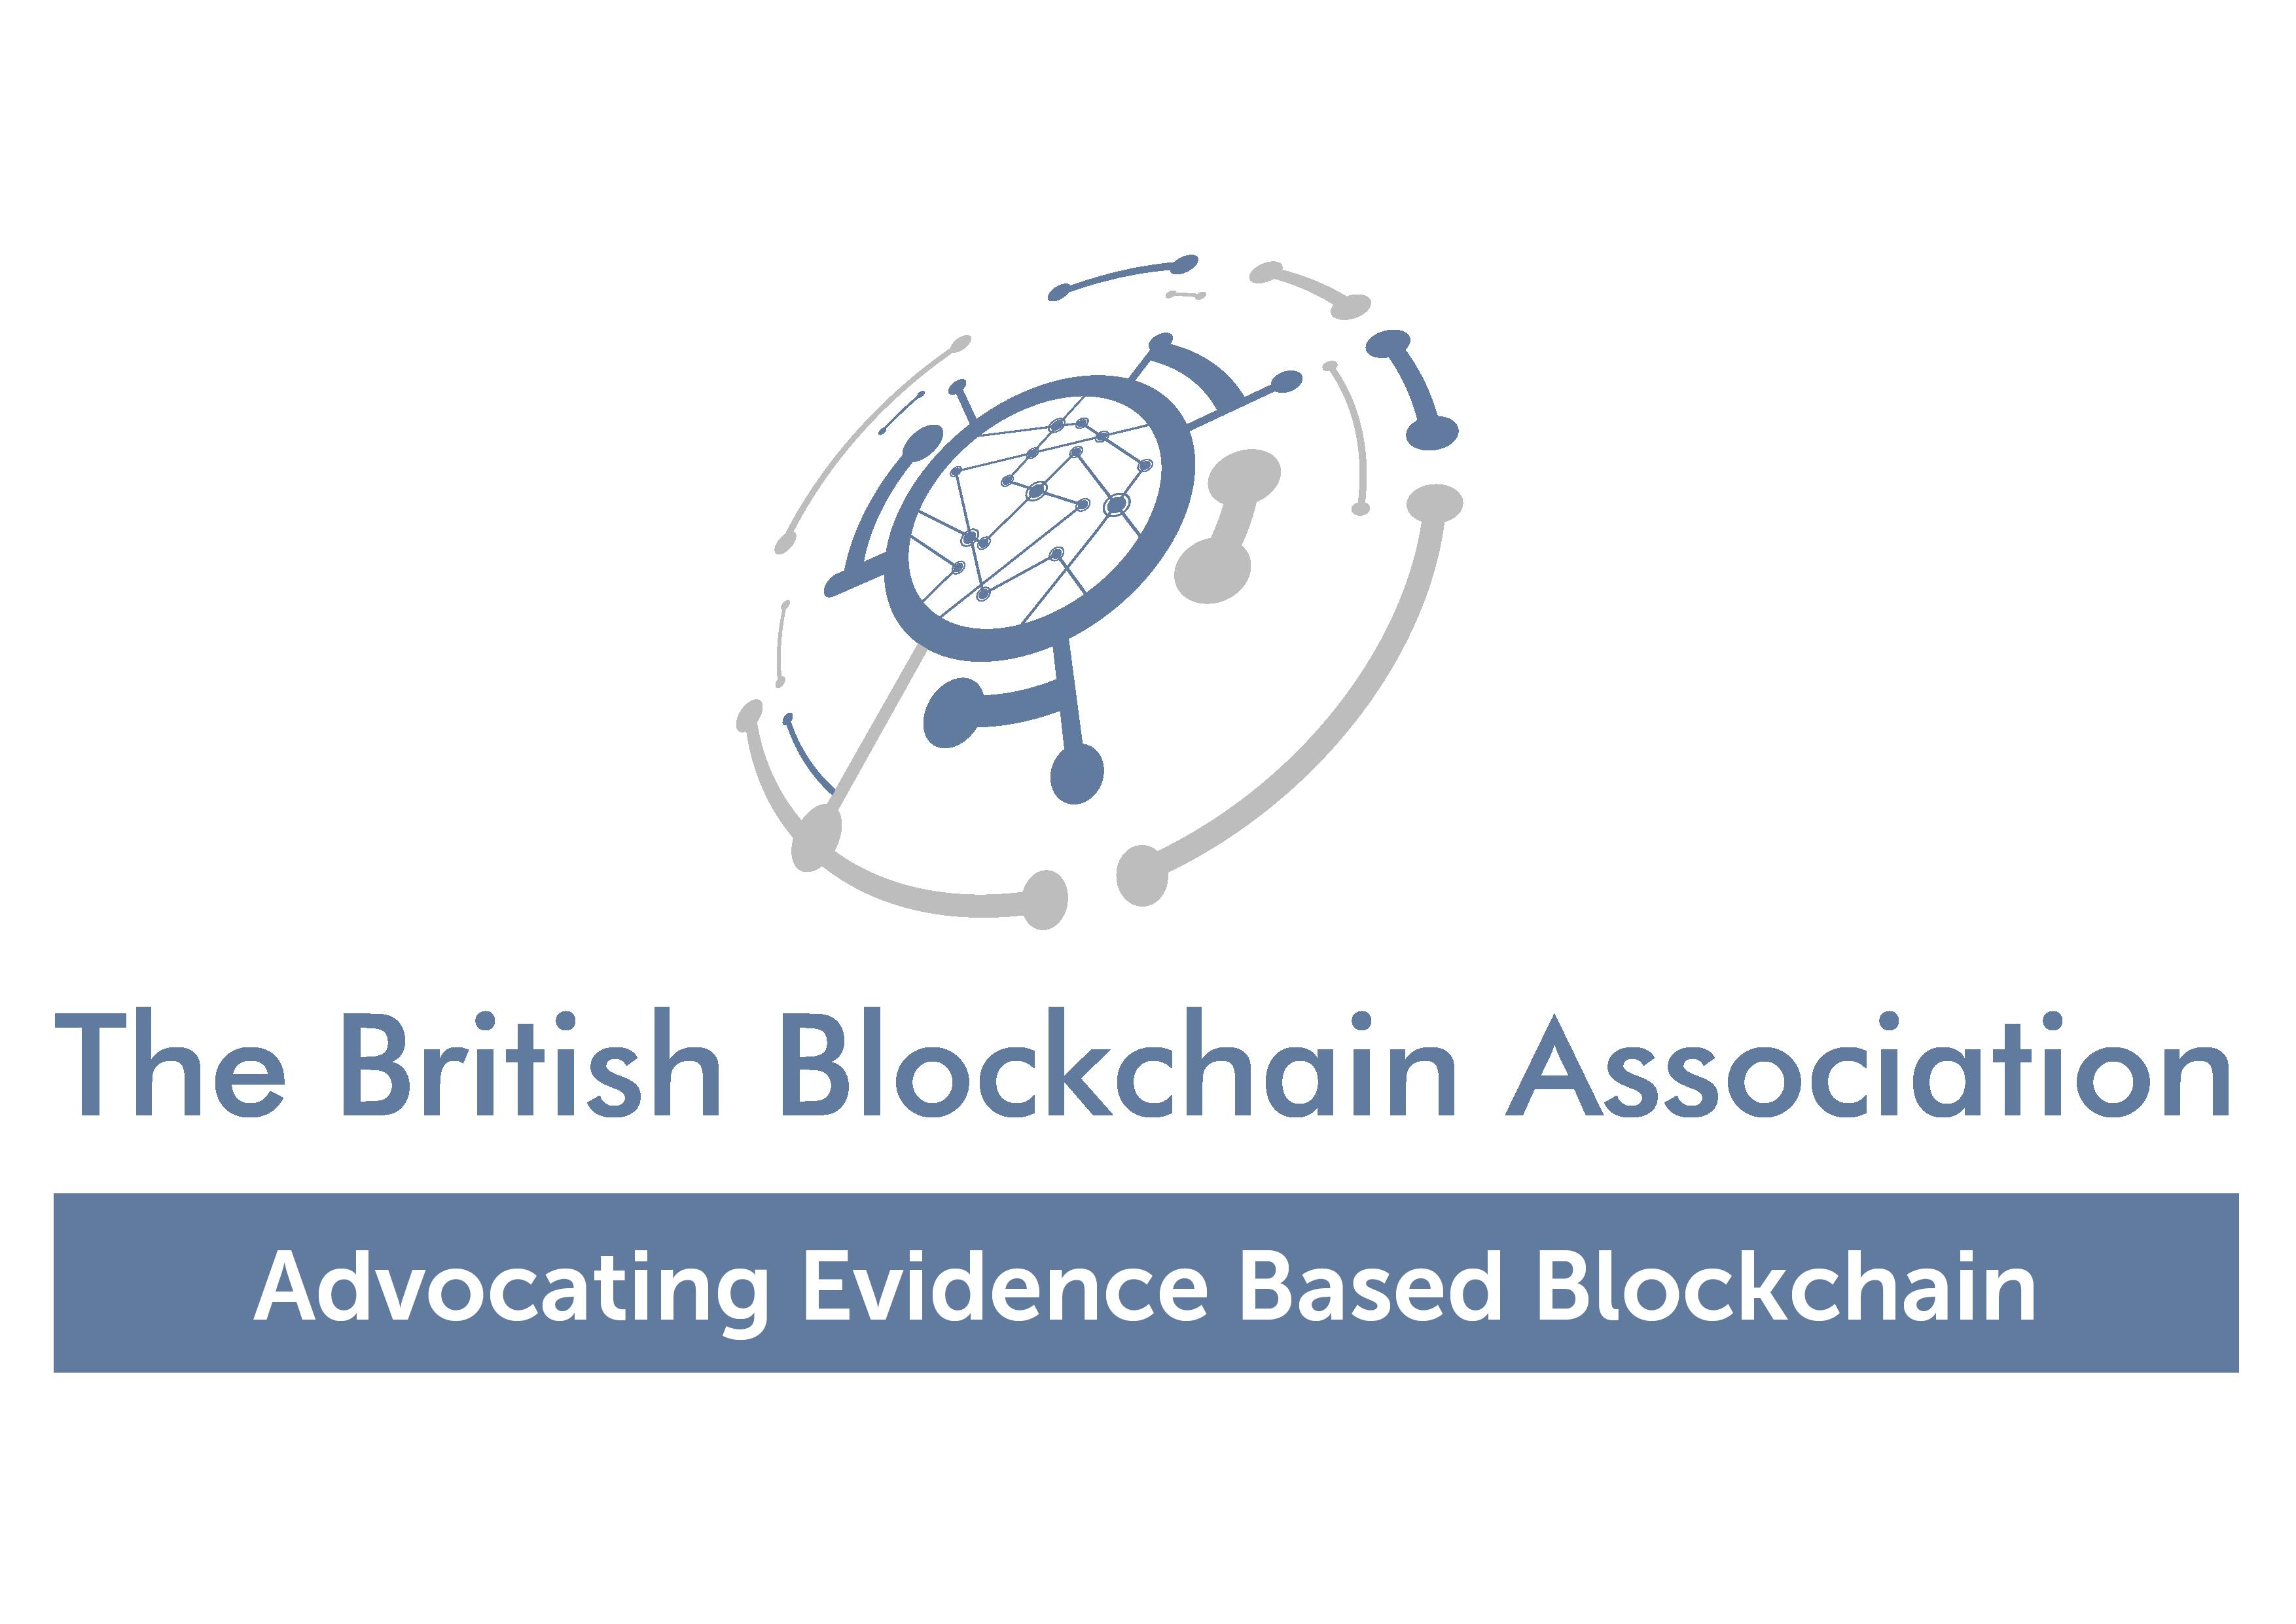 The British Blockchain Association.